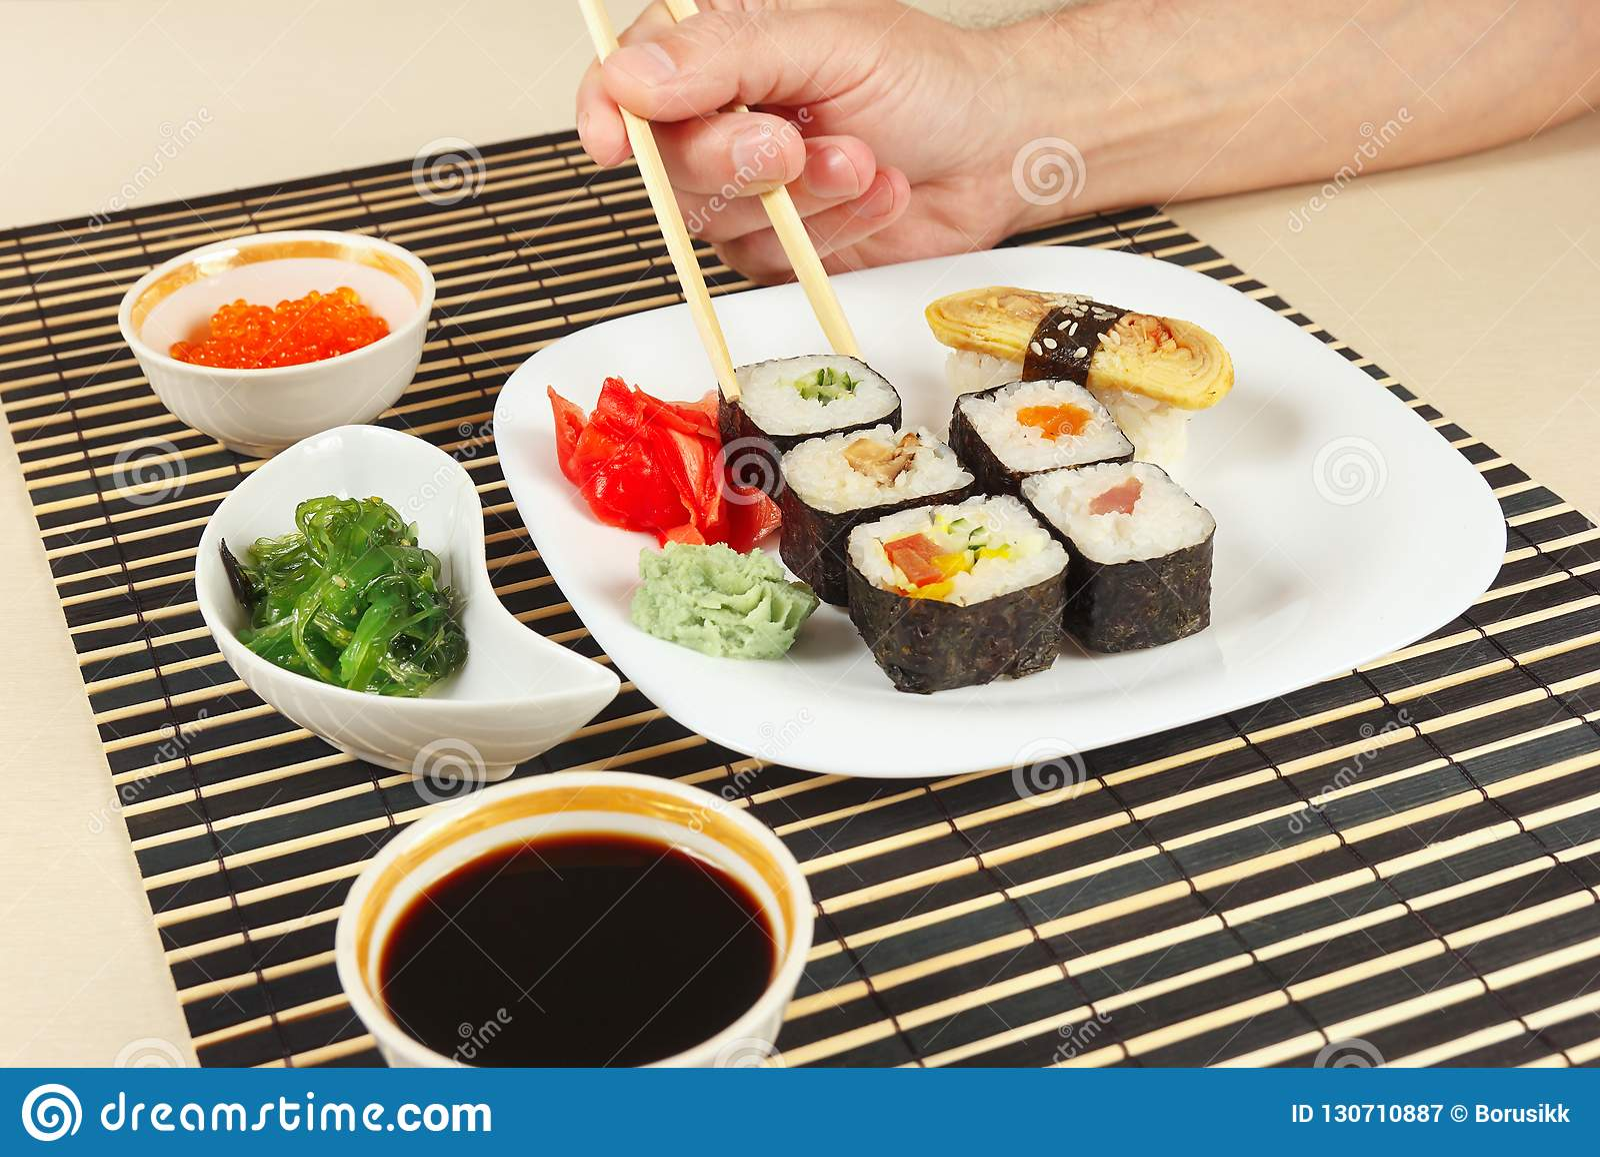 Hands Taking Sushi With Chopsticks Assorted Sushi Chuka